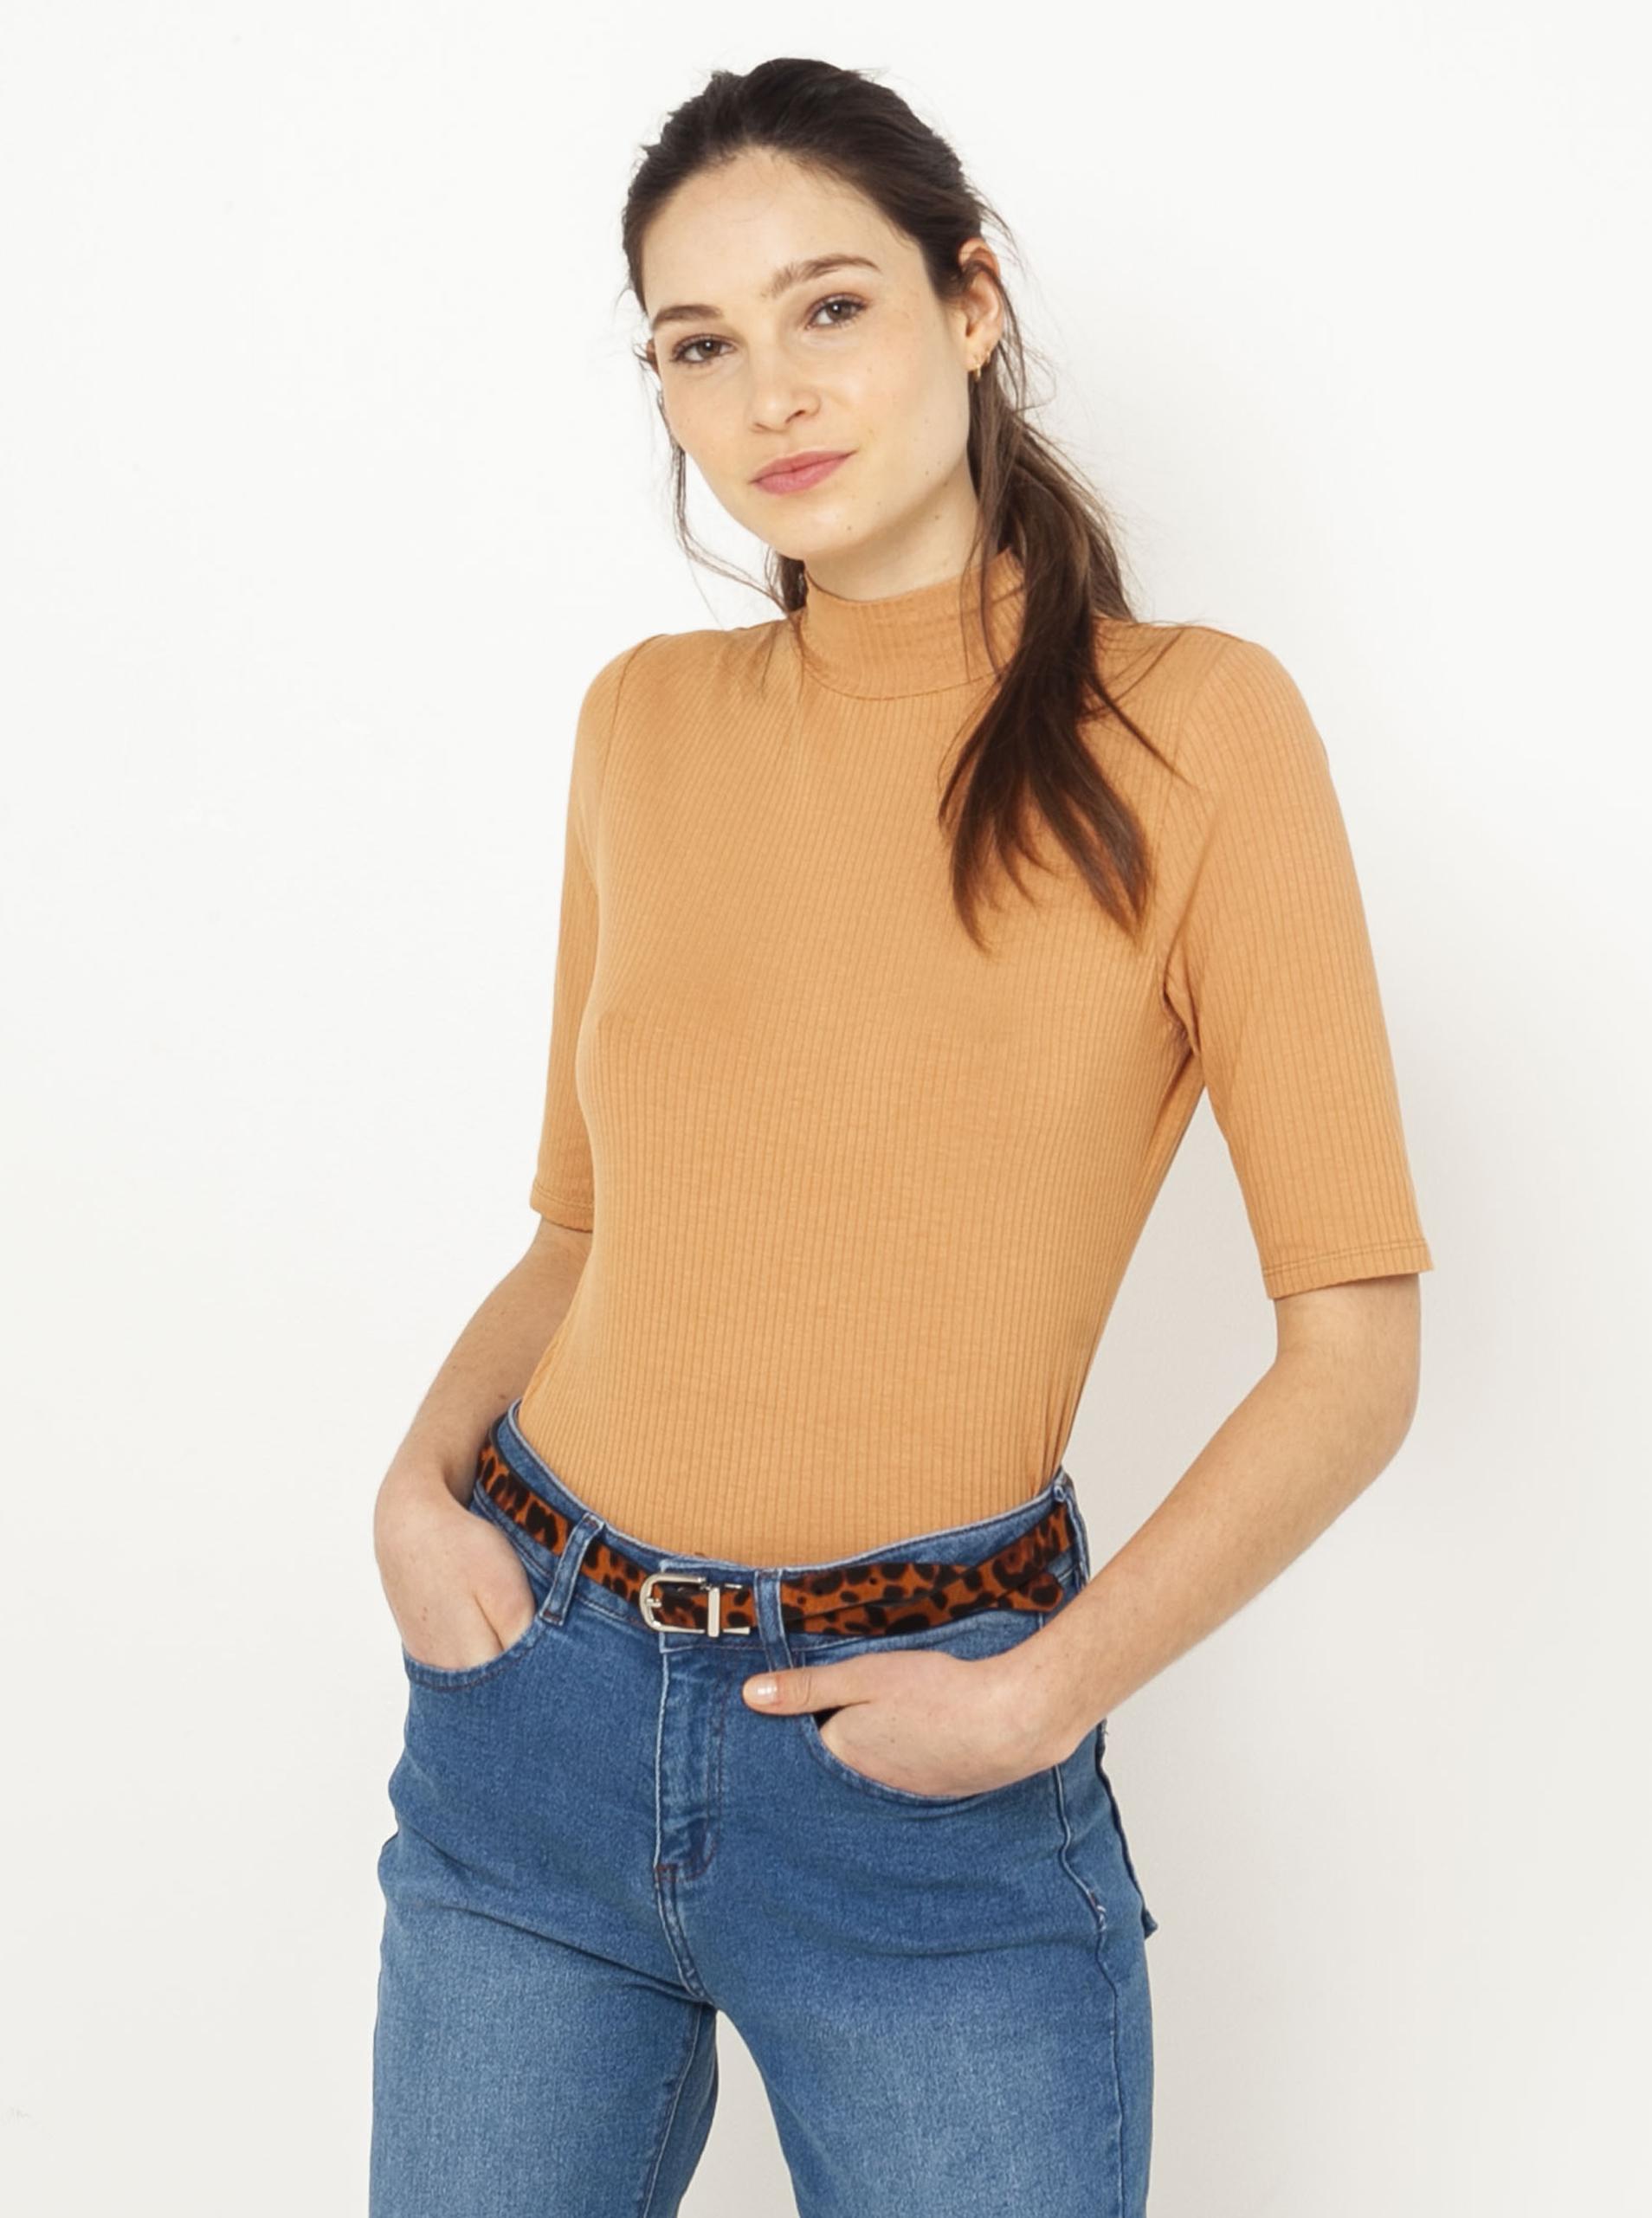 CAMAIEU Women's t-shirt brown